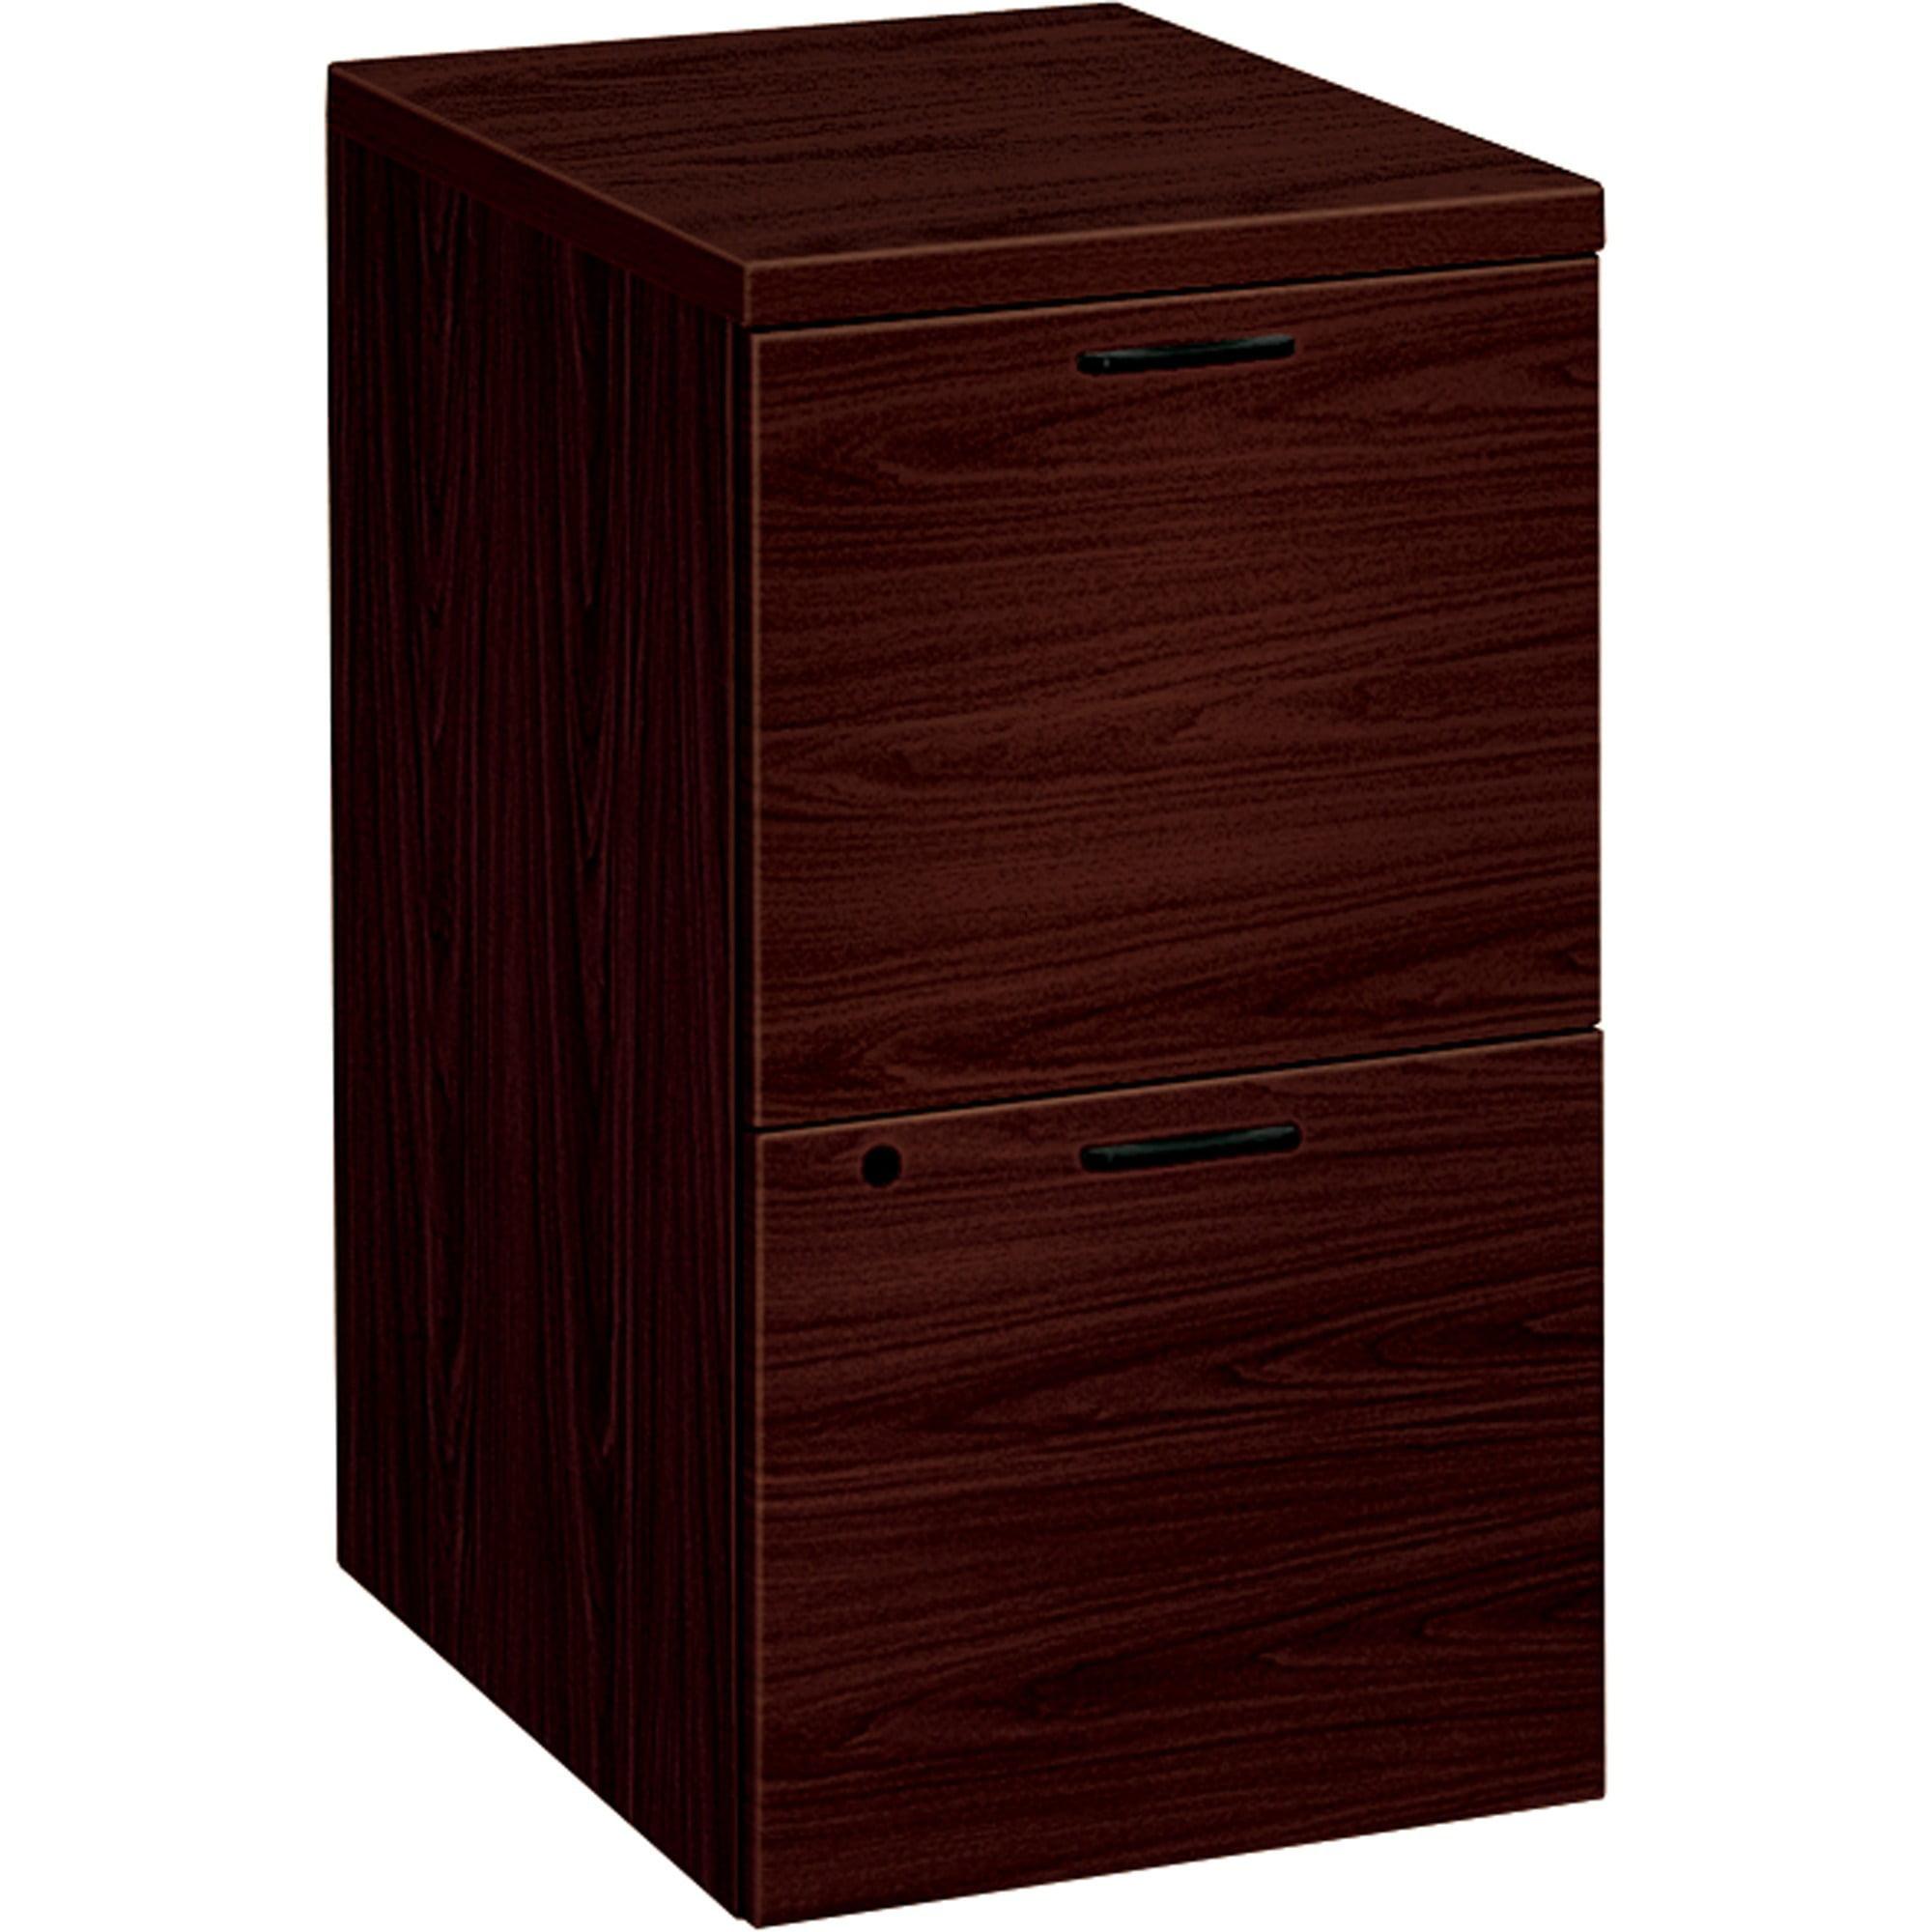 HON 2 Drawers Vertical Lockable Filing Cabinet, Brown